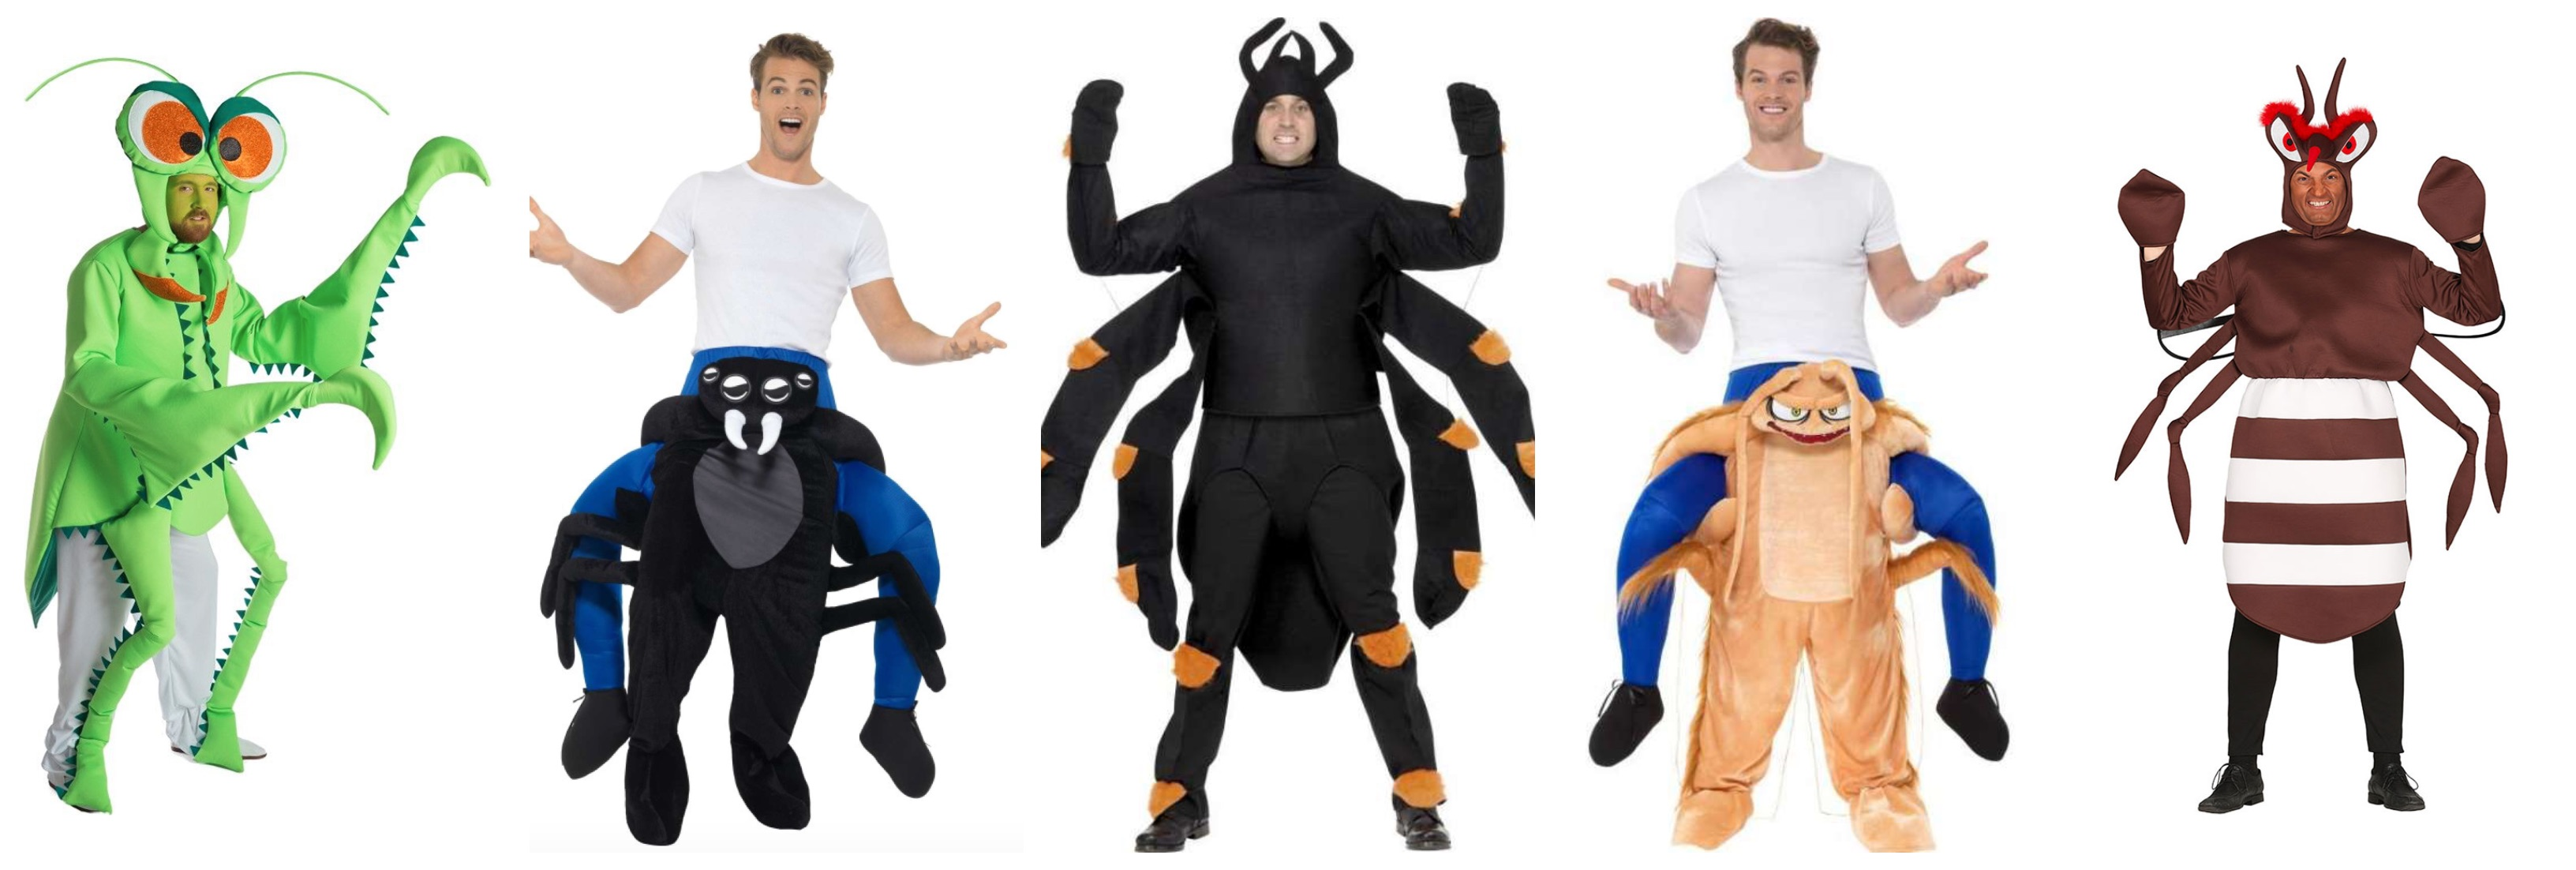 insekt kostume - Insekt kostume til voksne